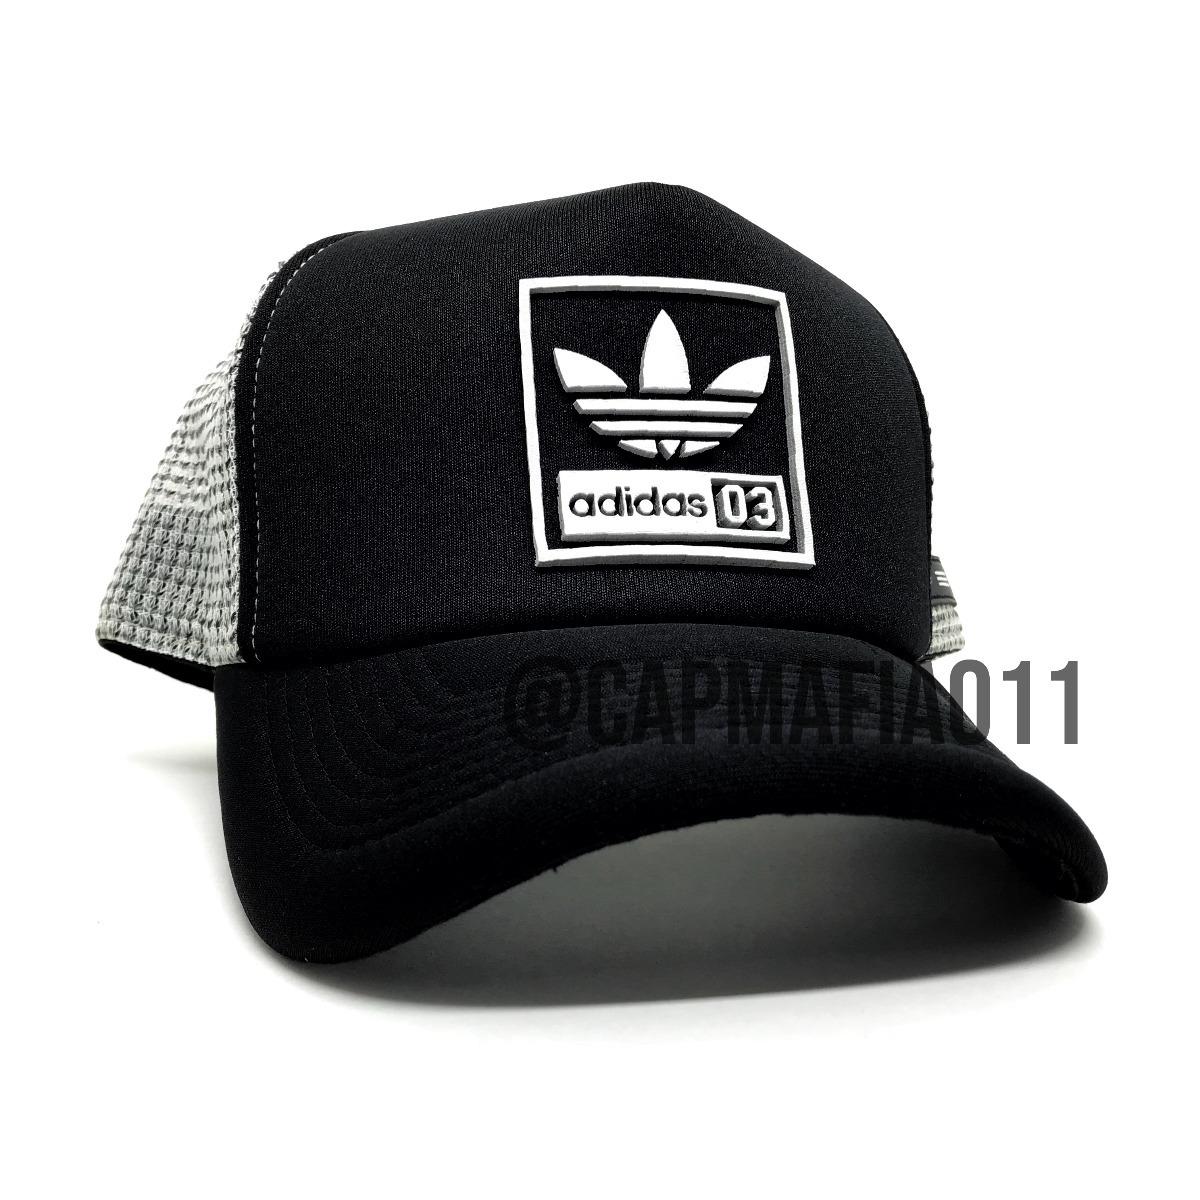 boné adidas trefoil square black grey aba curva trucker tela. Carregando  zoom. 11e47cc4db620